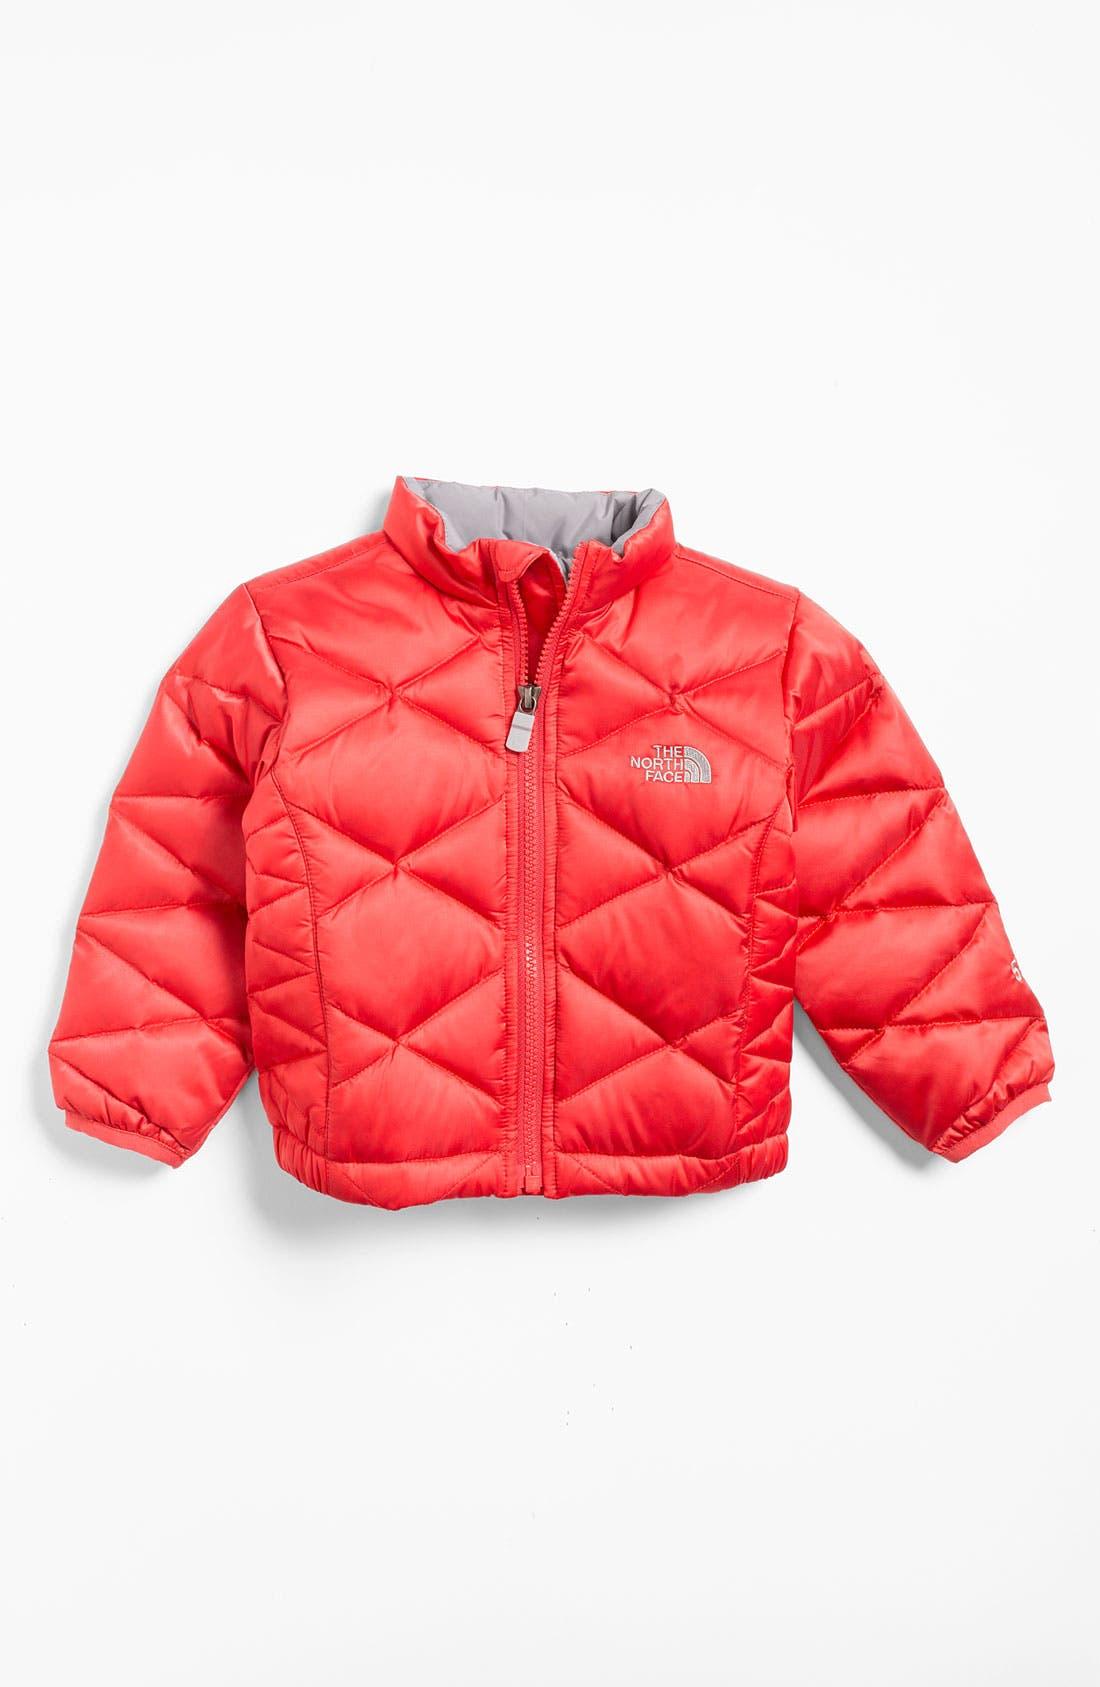 Main Image - The North Face 'Aconcagua' Jacket (Infant)